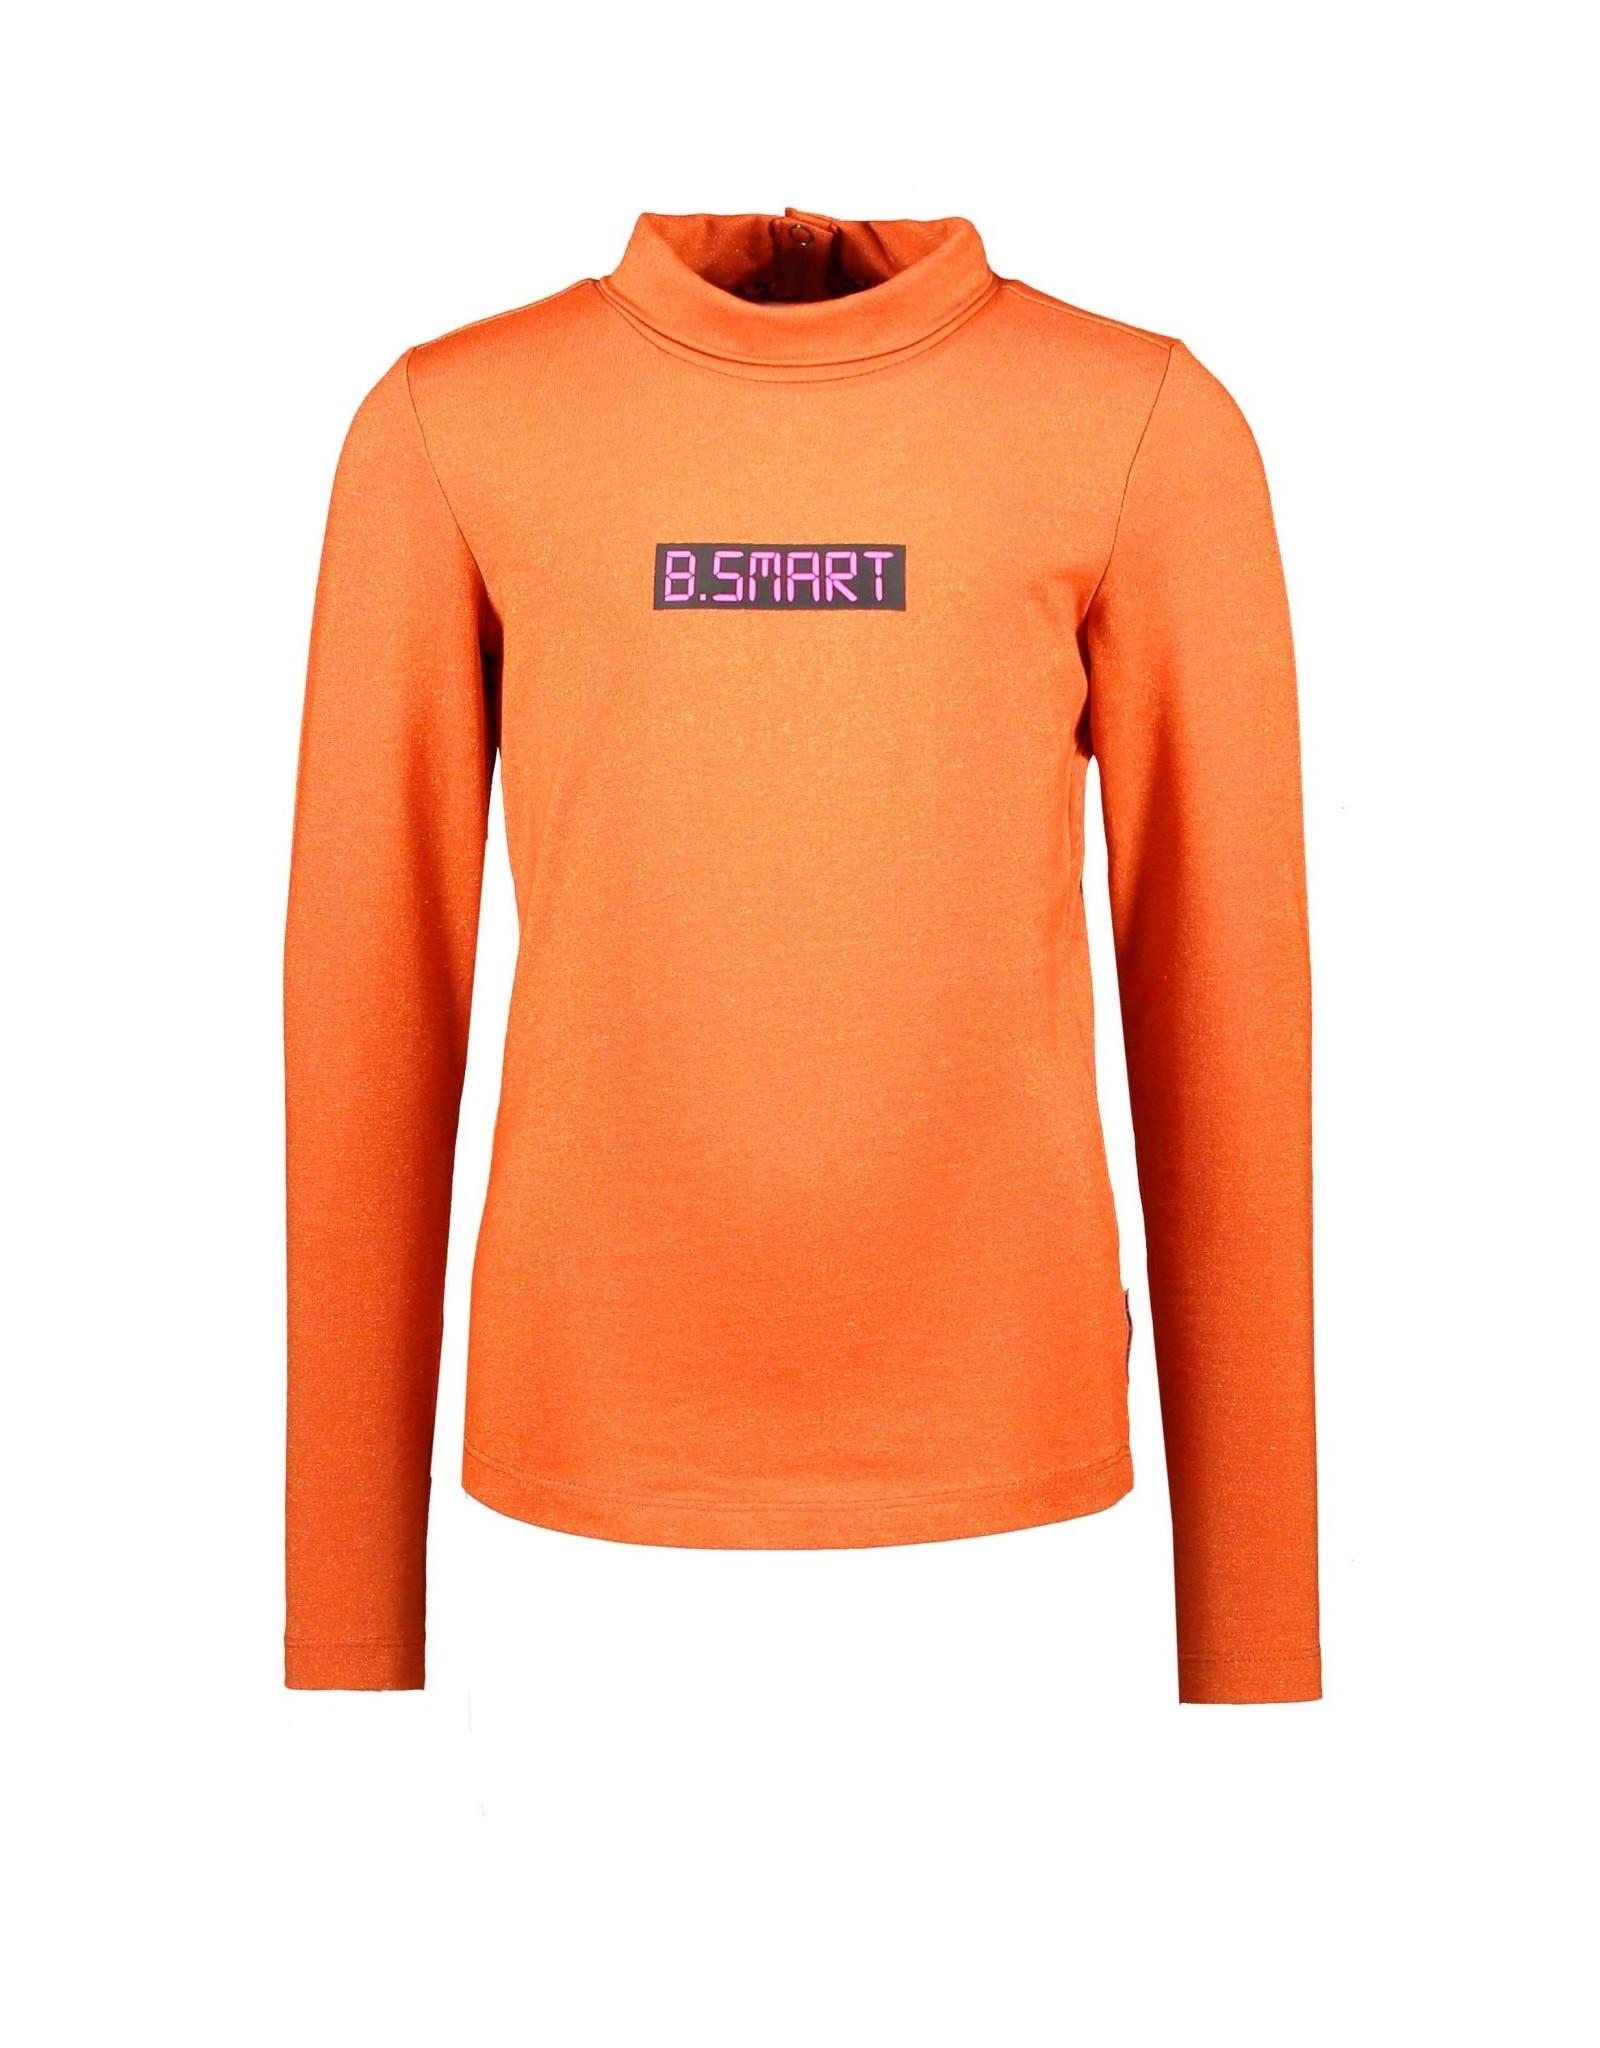 B.Nosy B.Nosy meisjes colshirt B.Smart Hot Orange